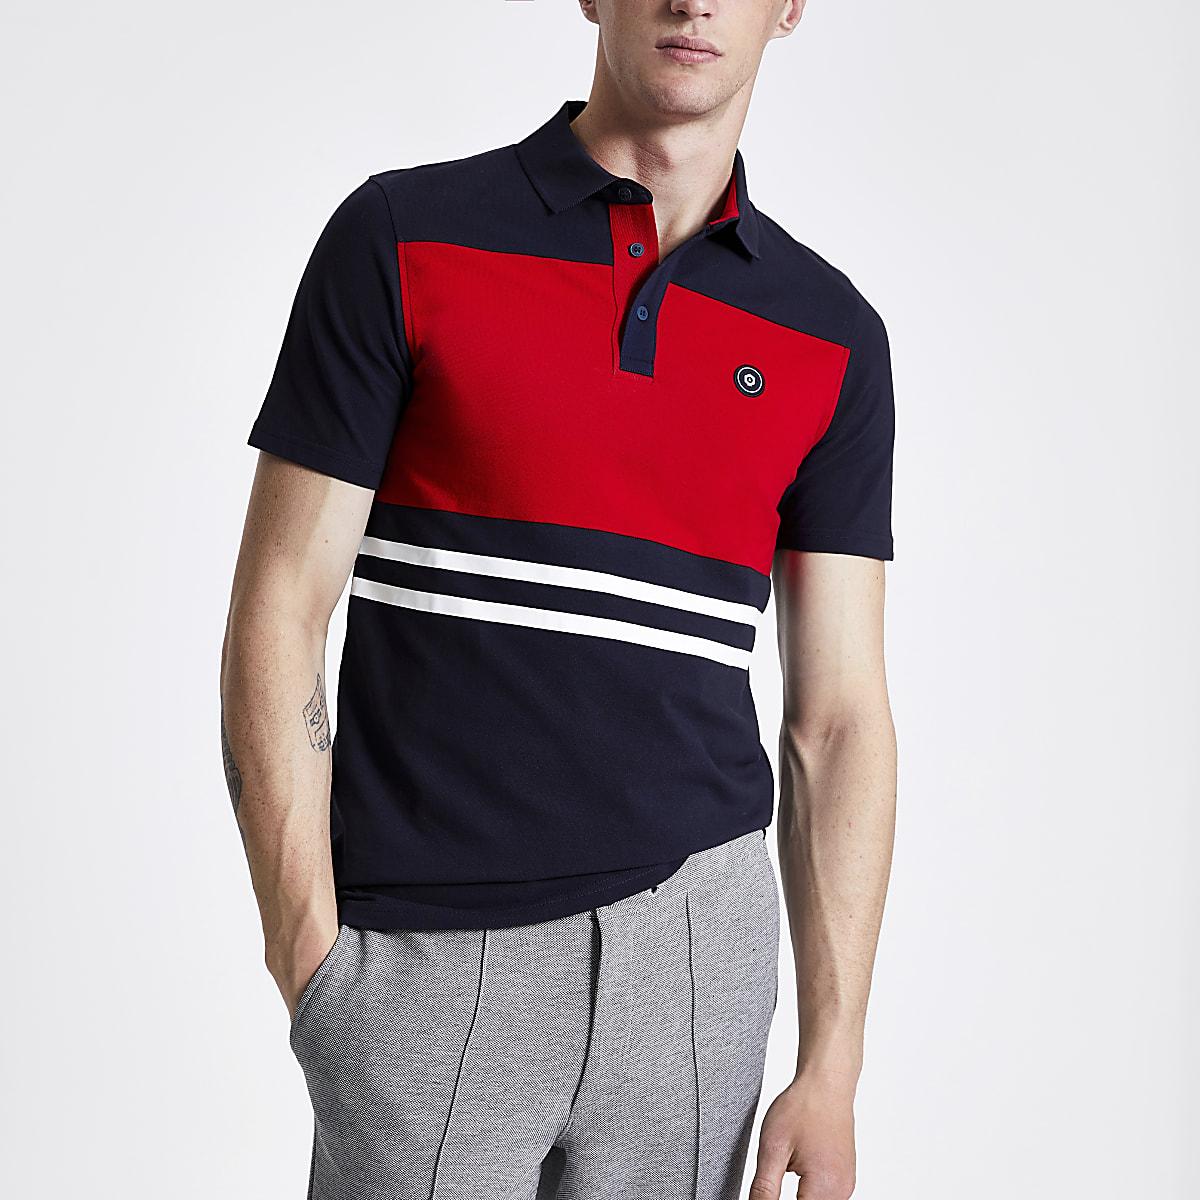 Jack and Jones navy polo shirt